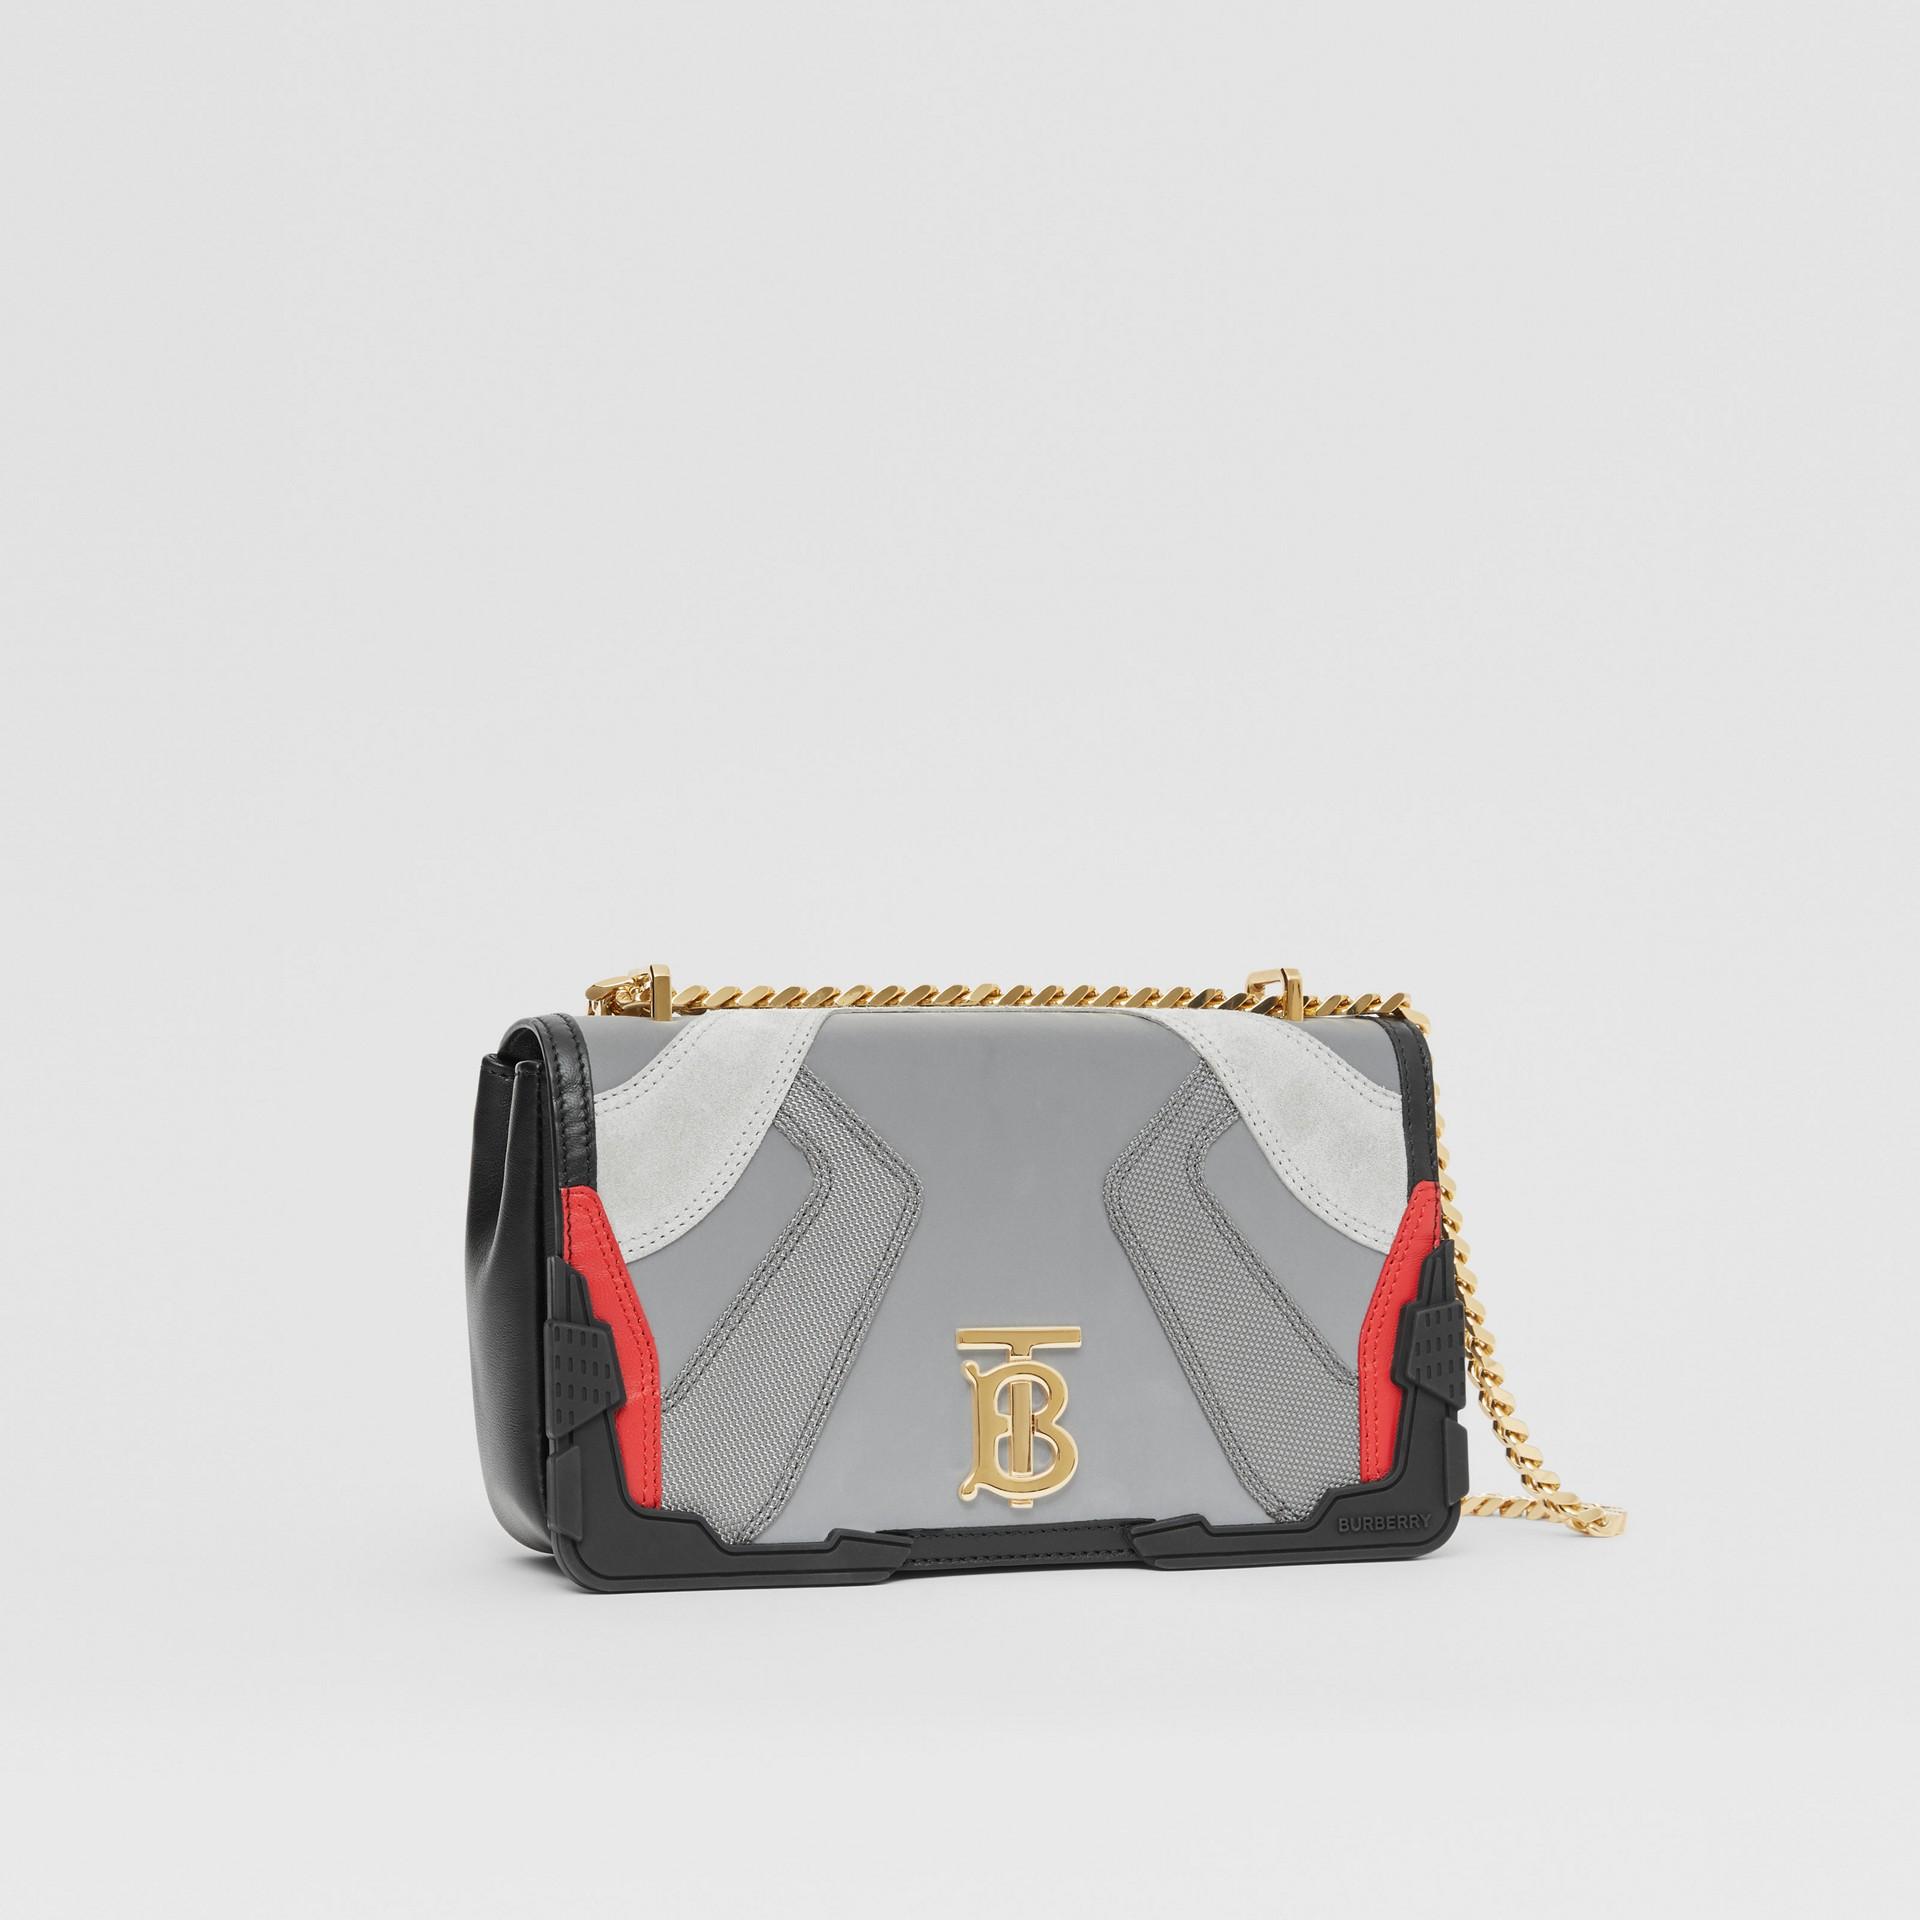 Small Appliqué Leather Lola Bag in Multicolour - Women | Burberry United Kingdom - gallery image 4